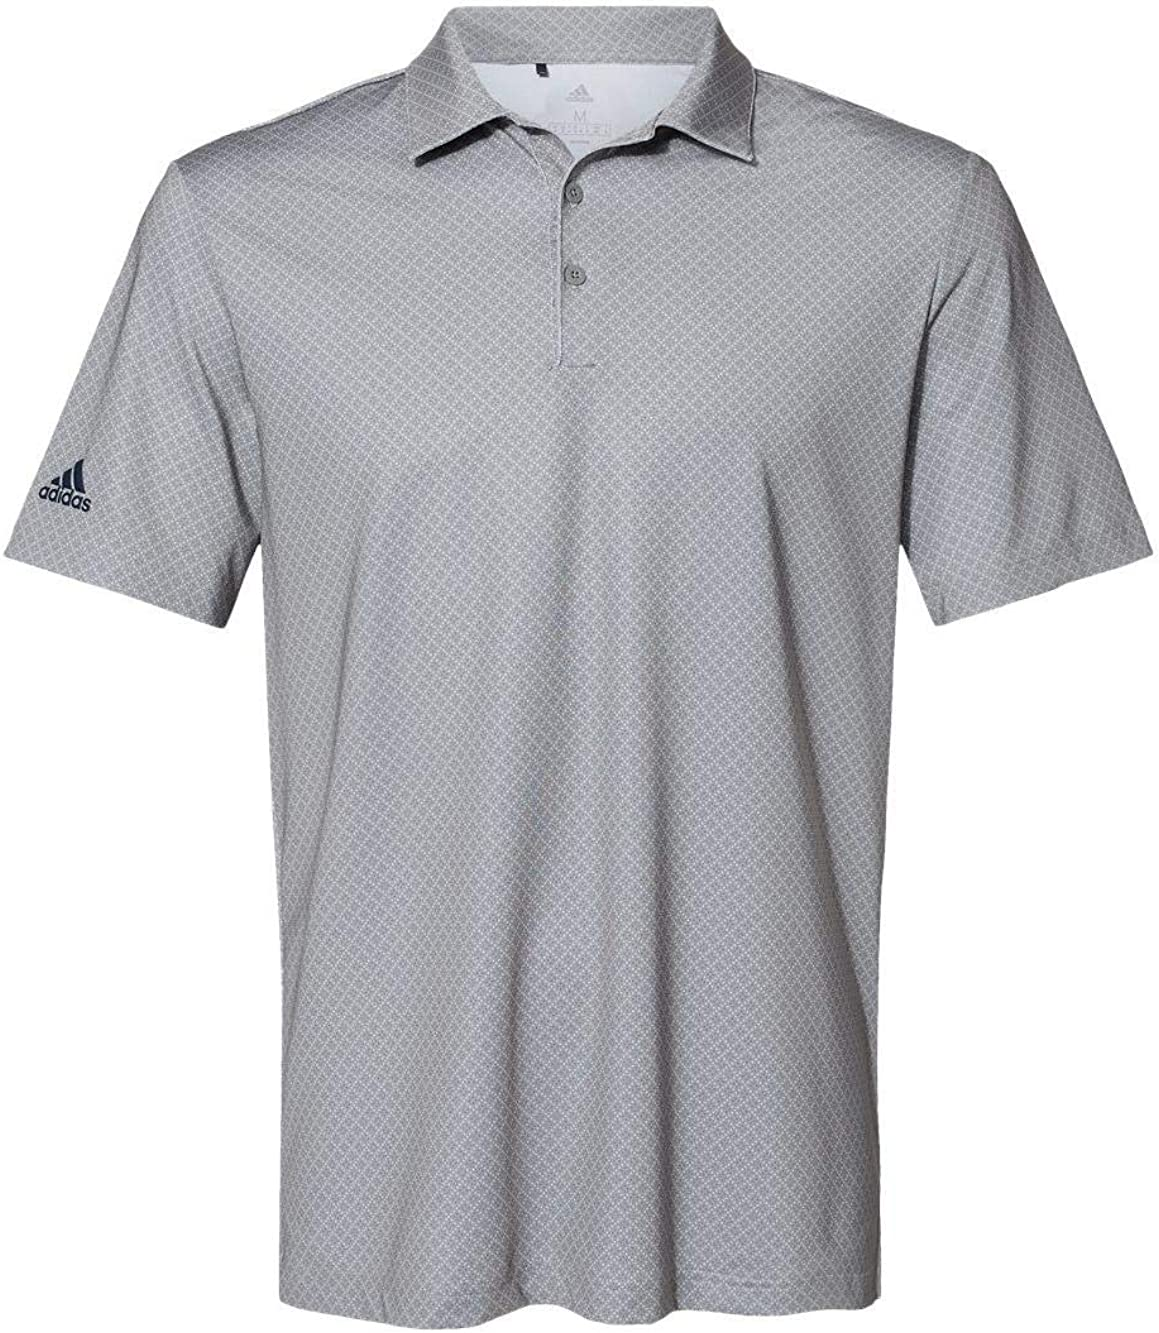 National uniform free shipping adidas - Diamond Dot Print Sport T Grey A498-3XL Shirt Dealing full price reduction Three